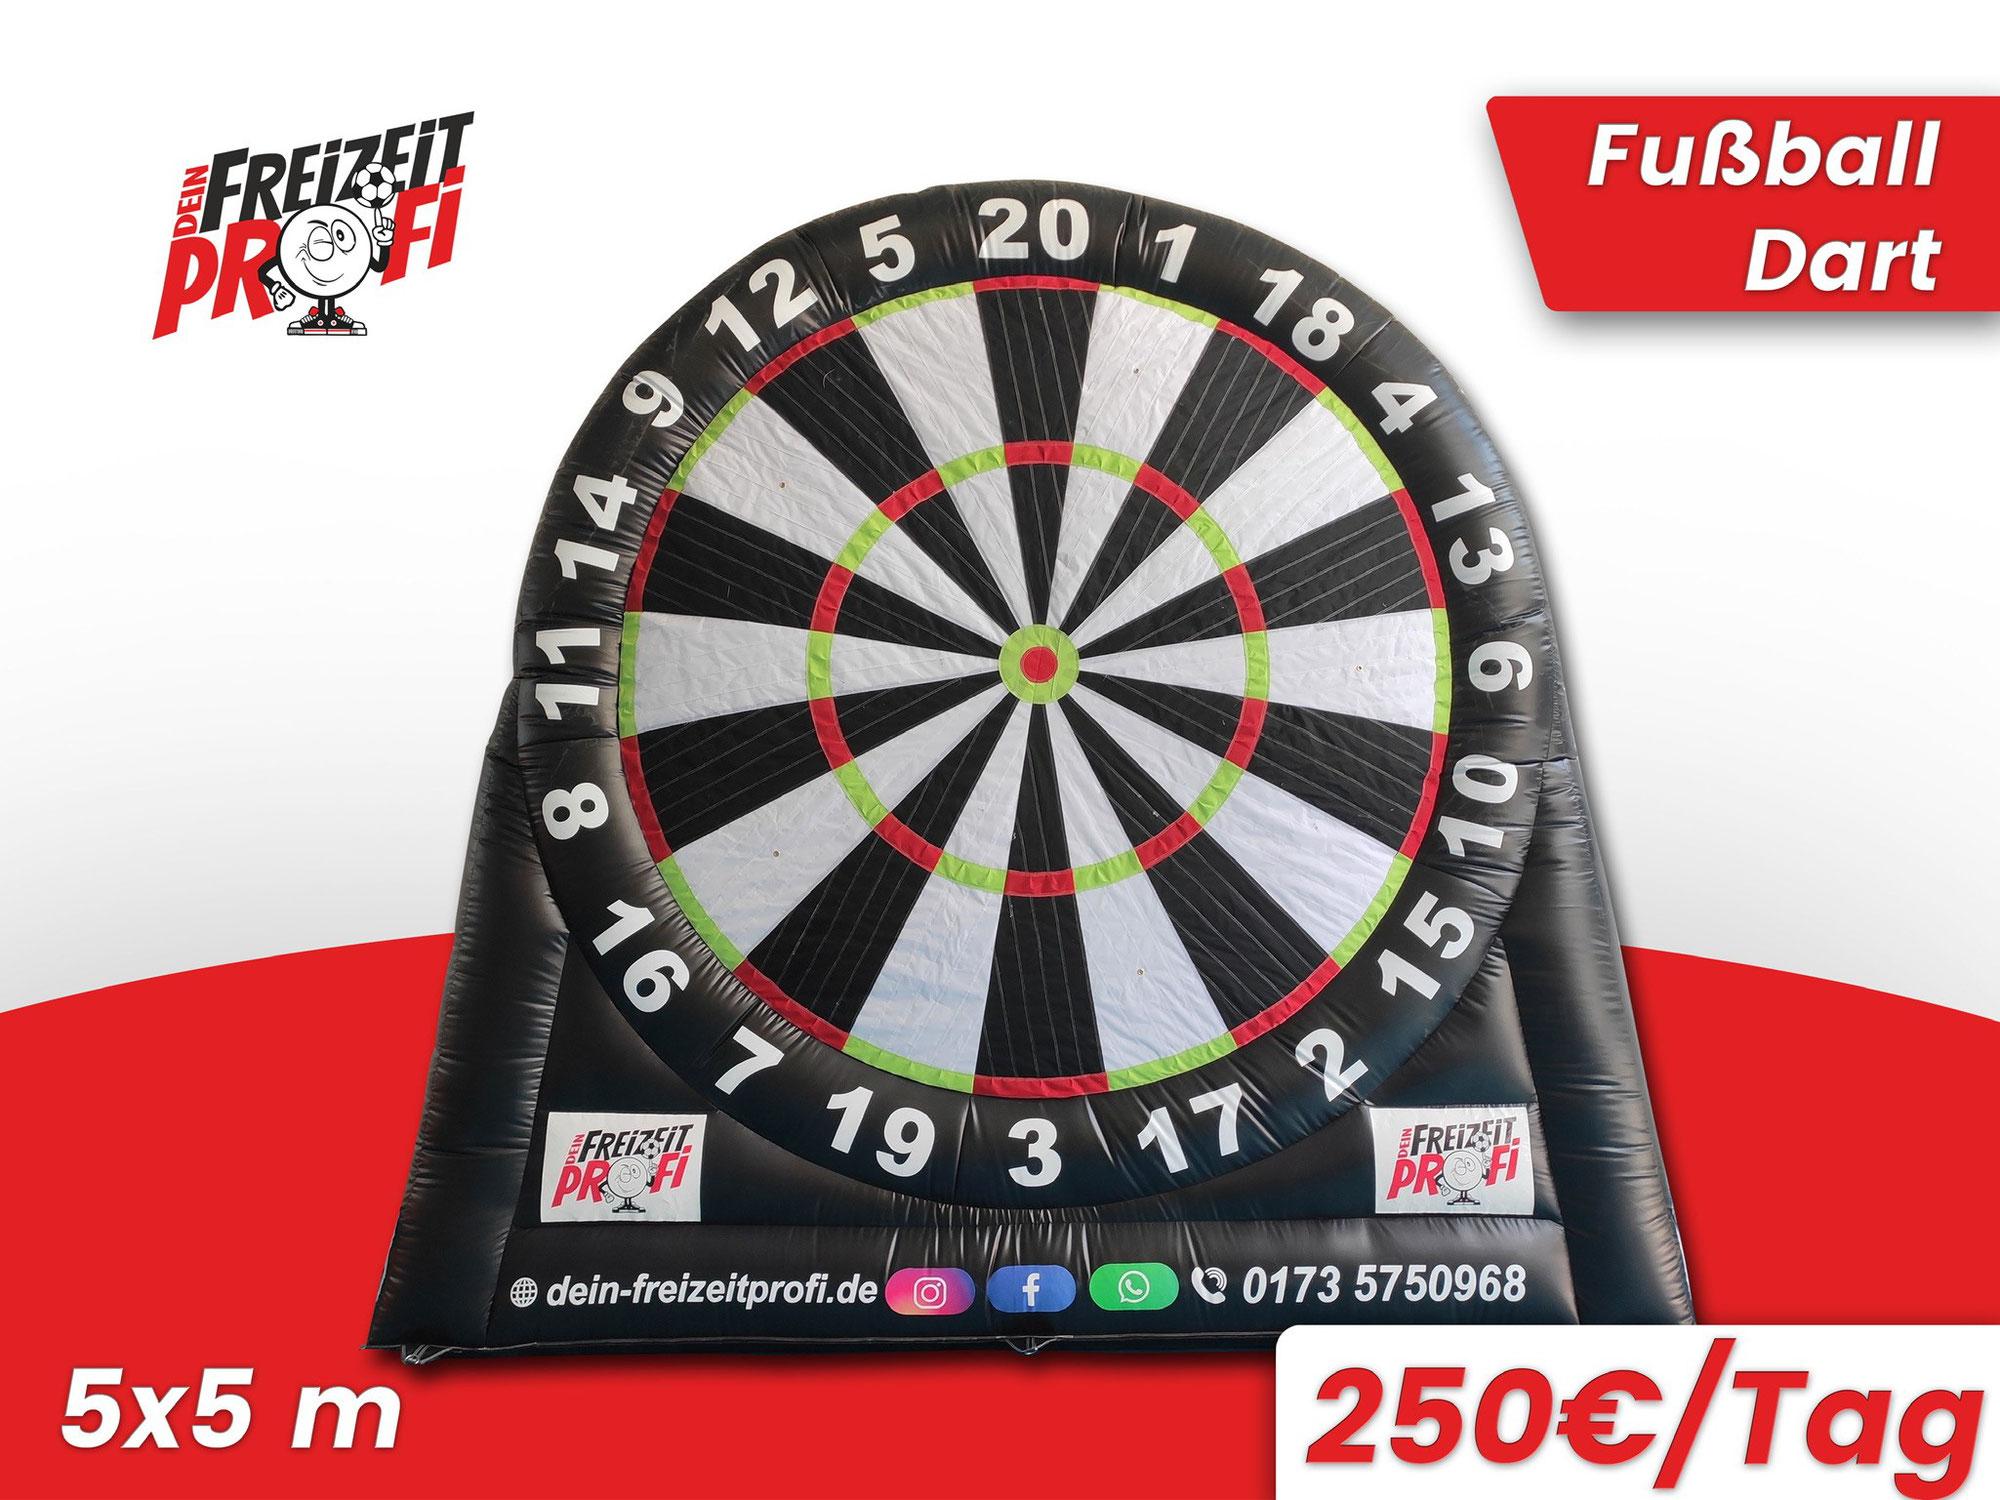 Wo kann man Fussball Dart in Kassel mieten ?